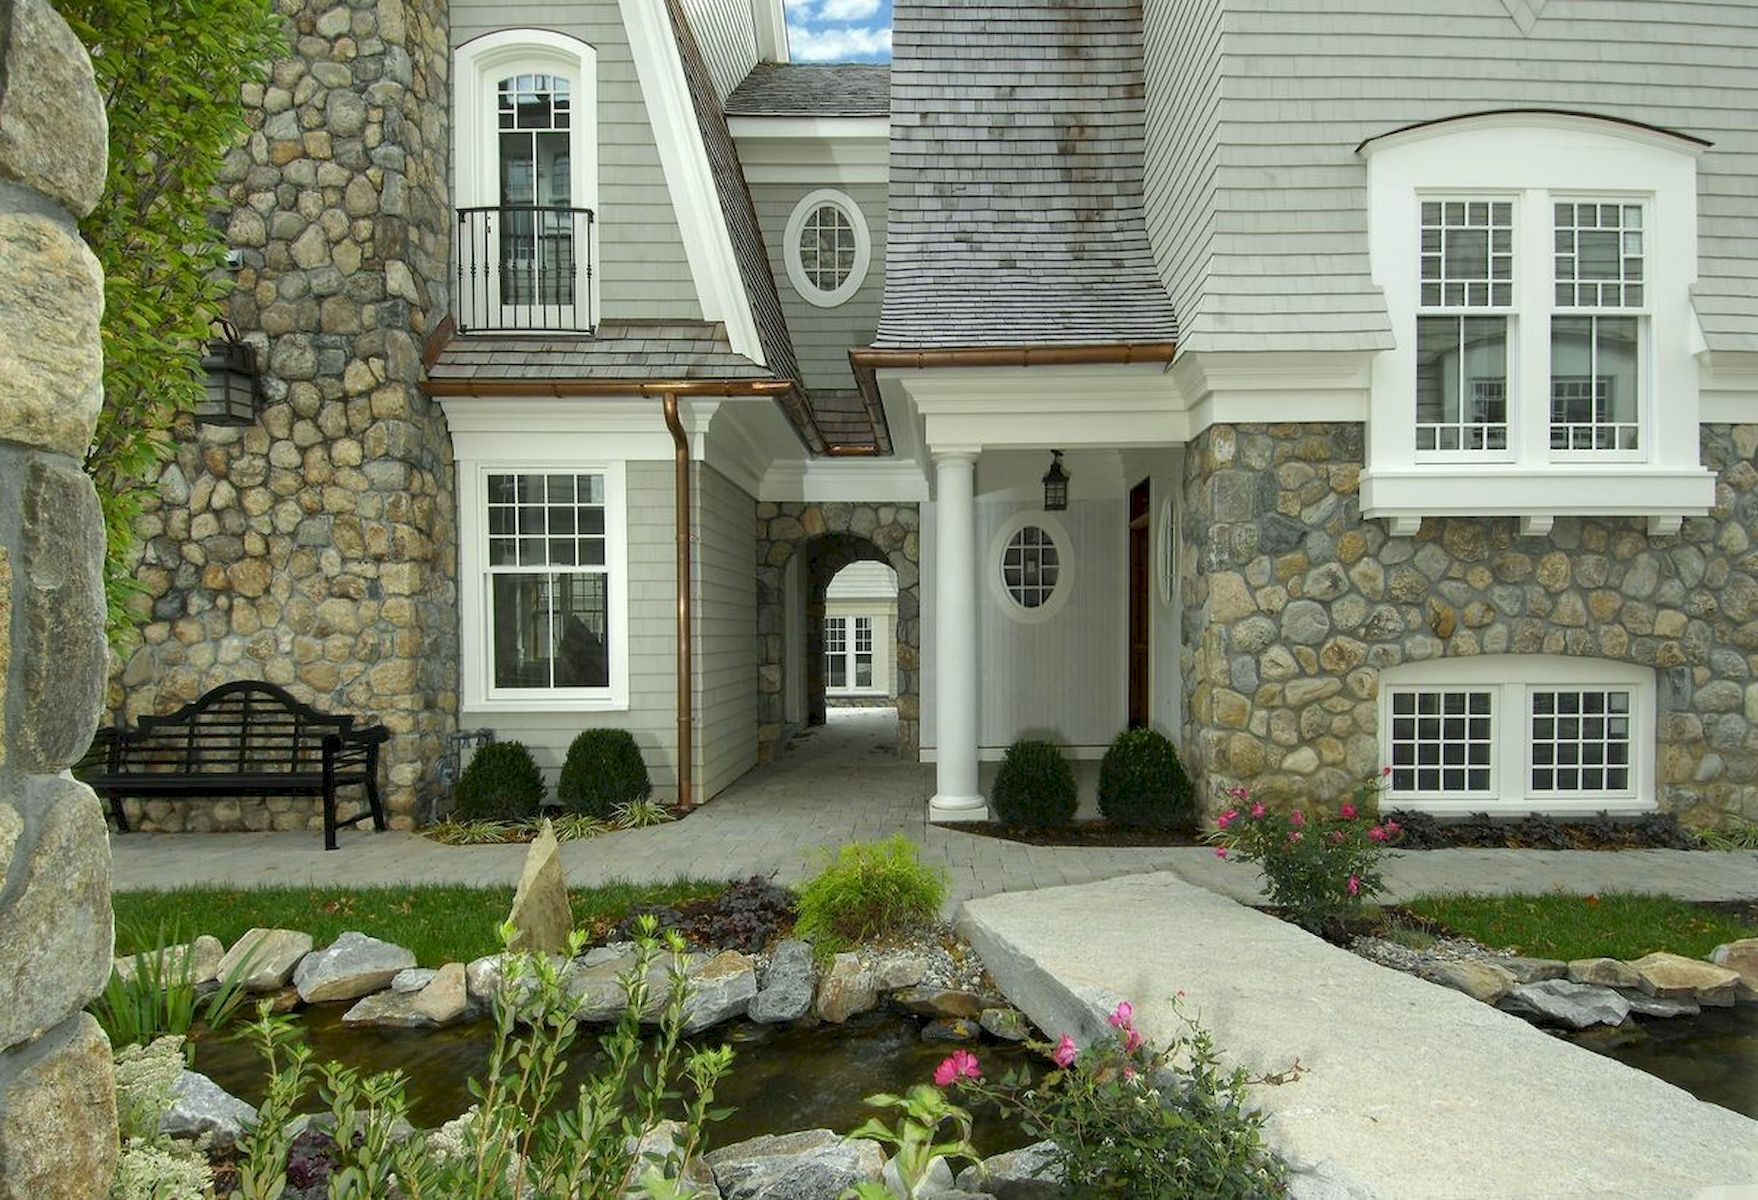 70 Stunning Exterior House Design Ideas (19)